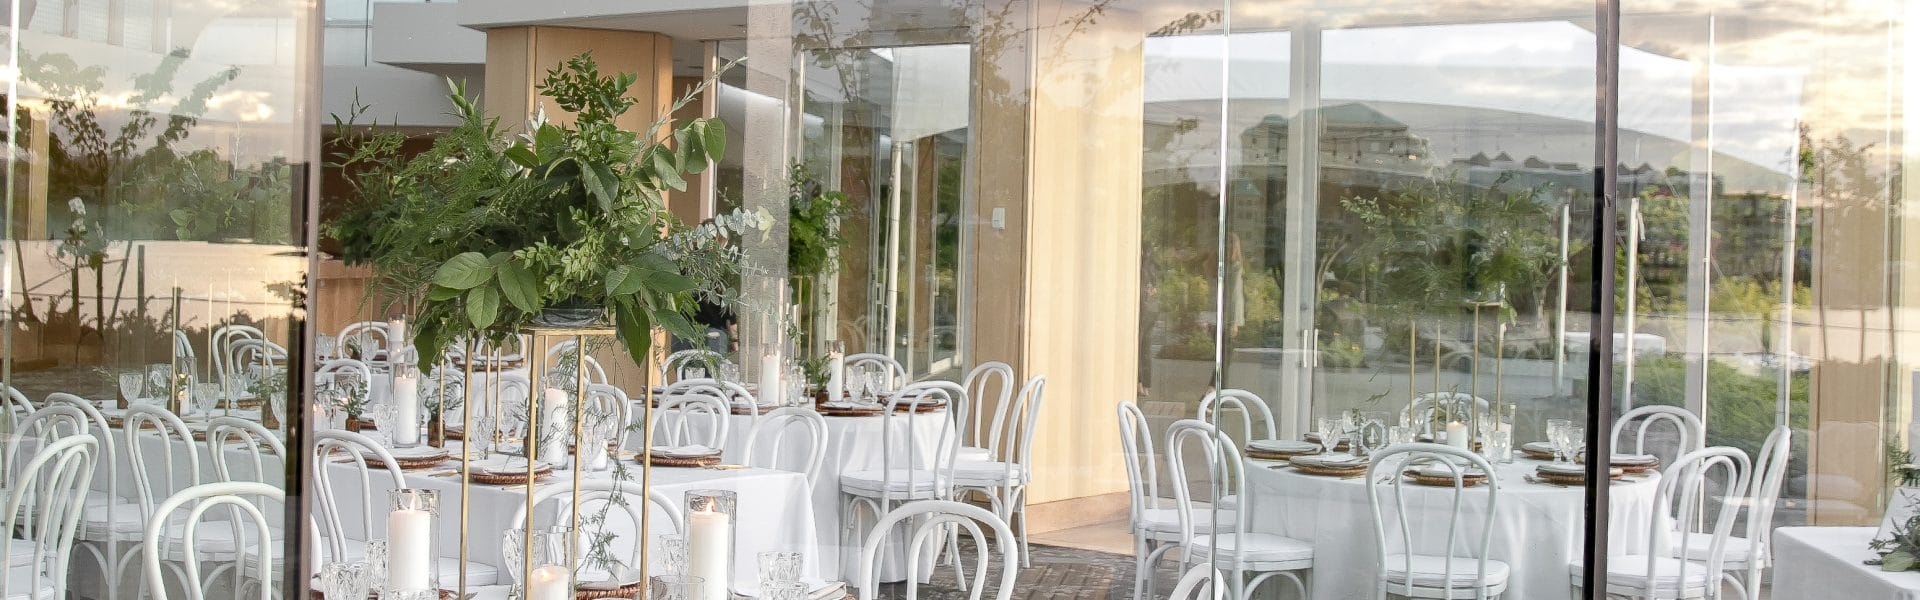 Greenhouse Wedding Inn at Laurel Point